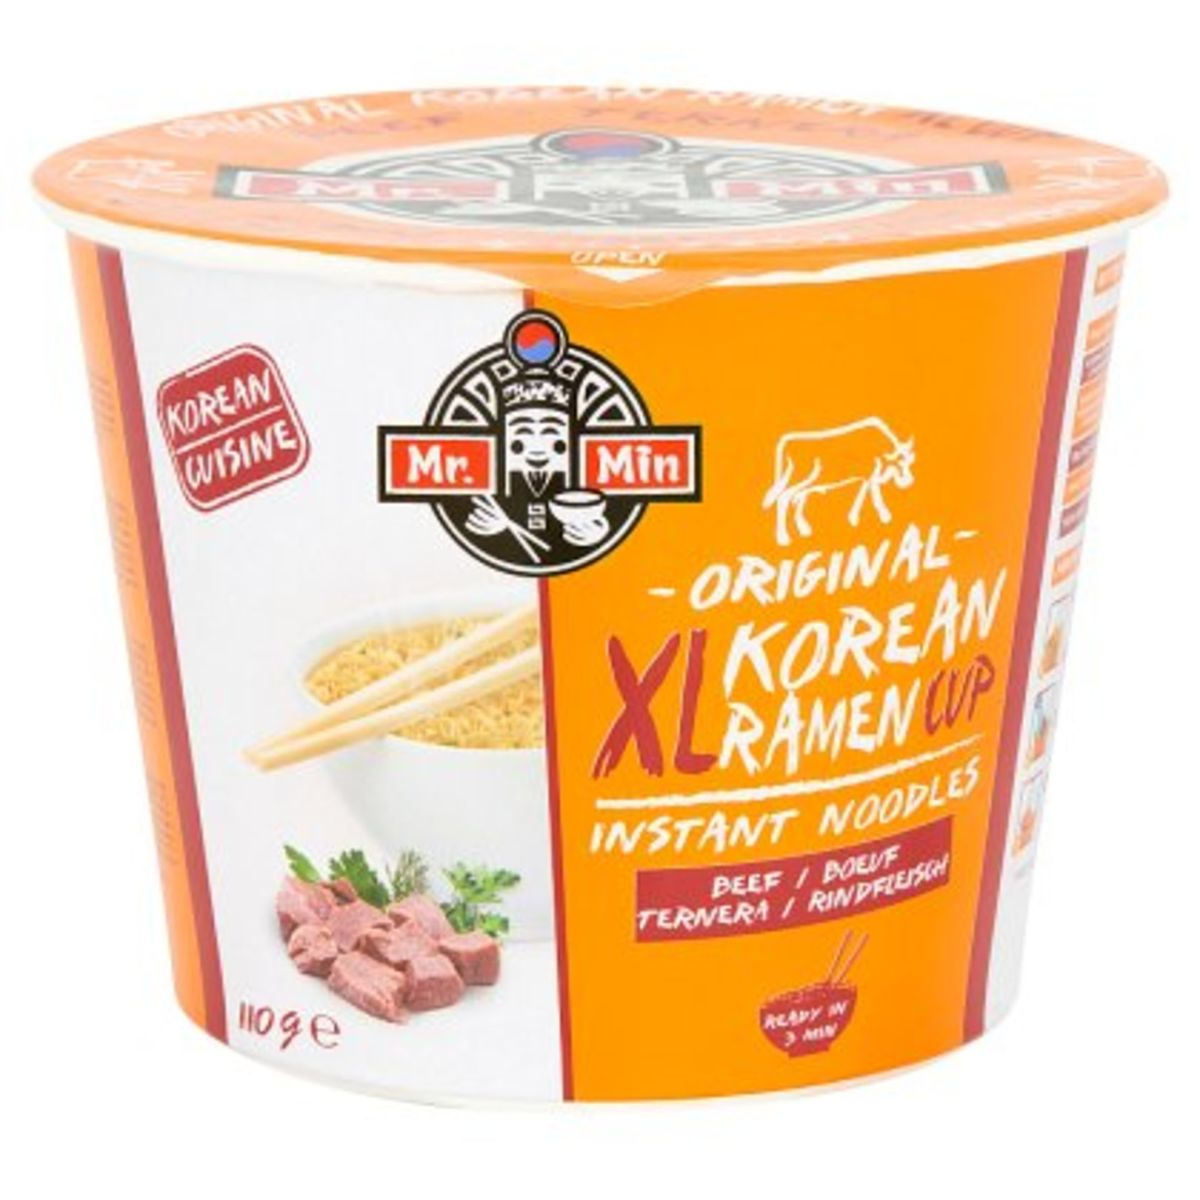 Mr. Min Original Korean Ramen Cup XL Instant Noodles Beef 110 g